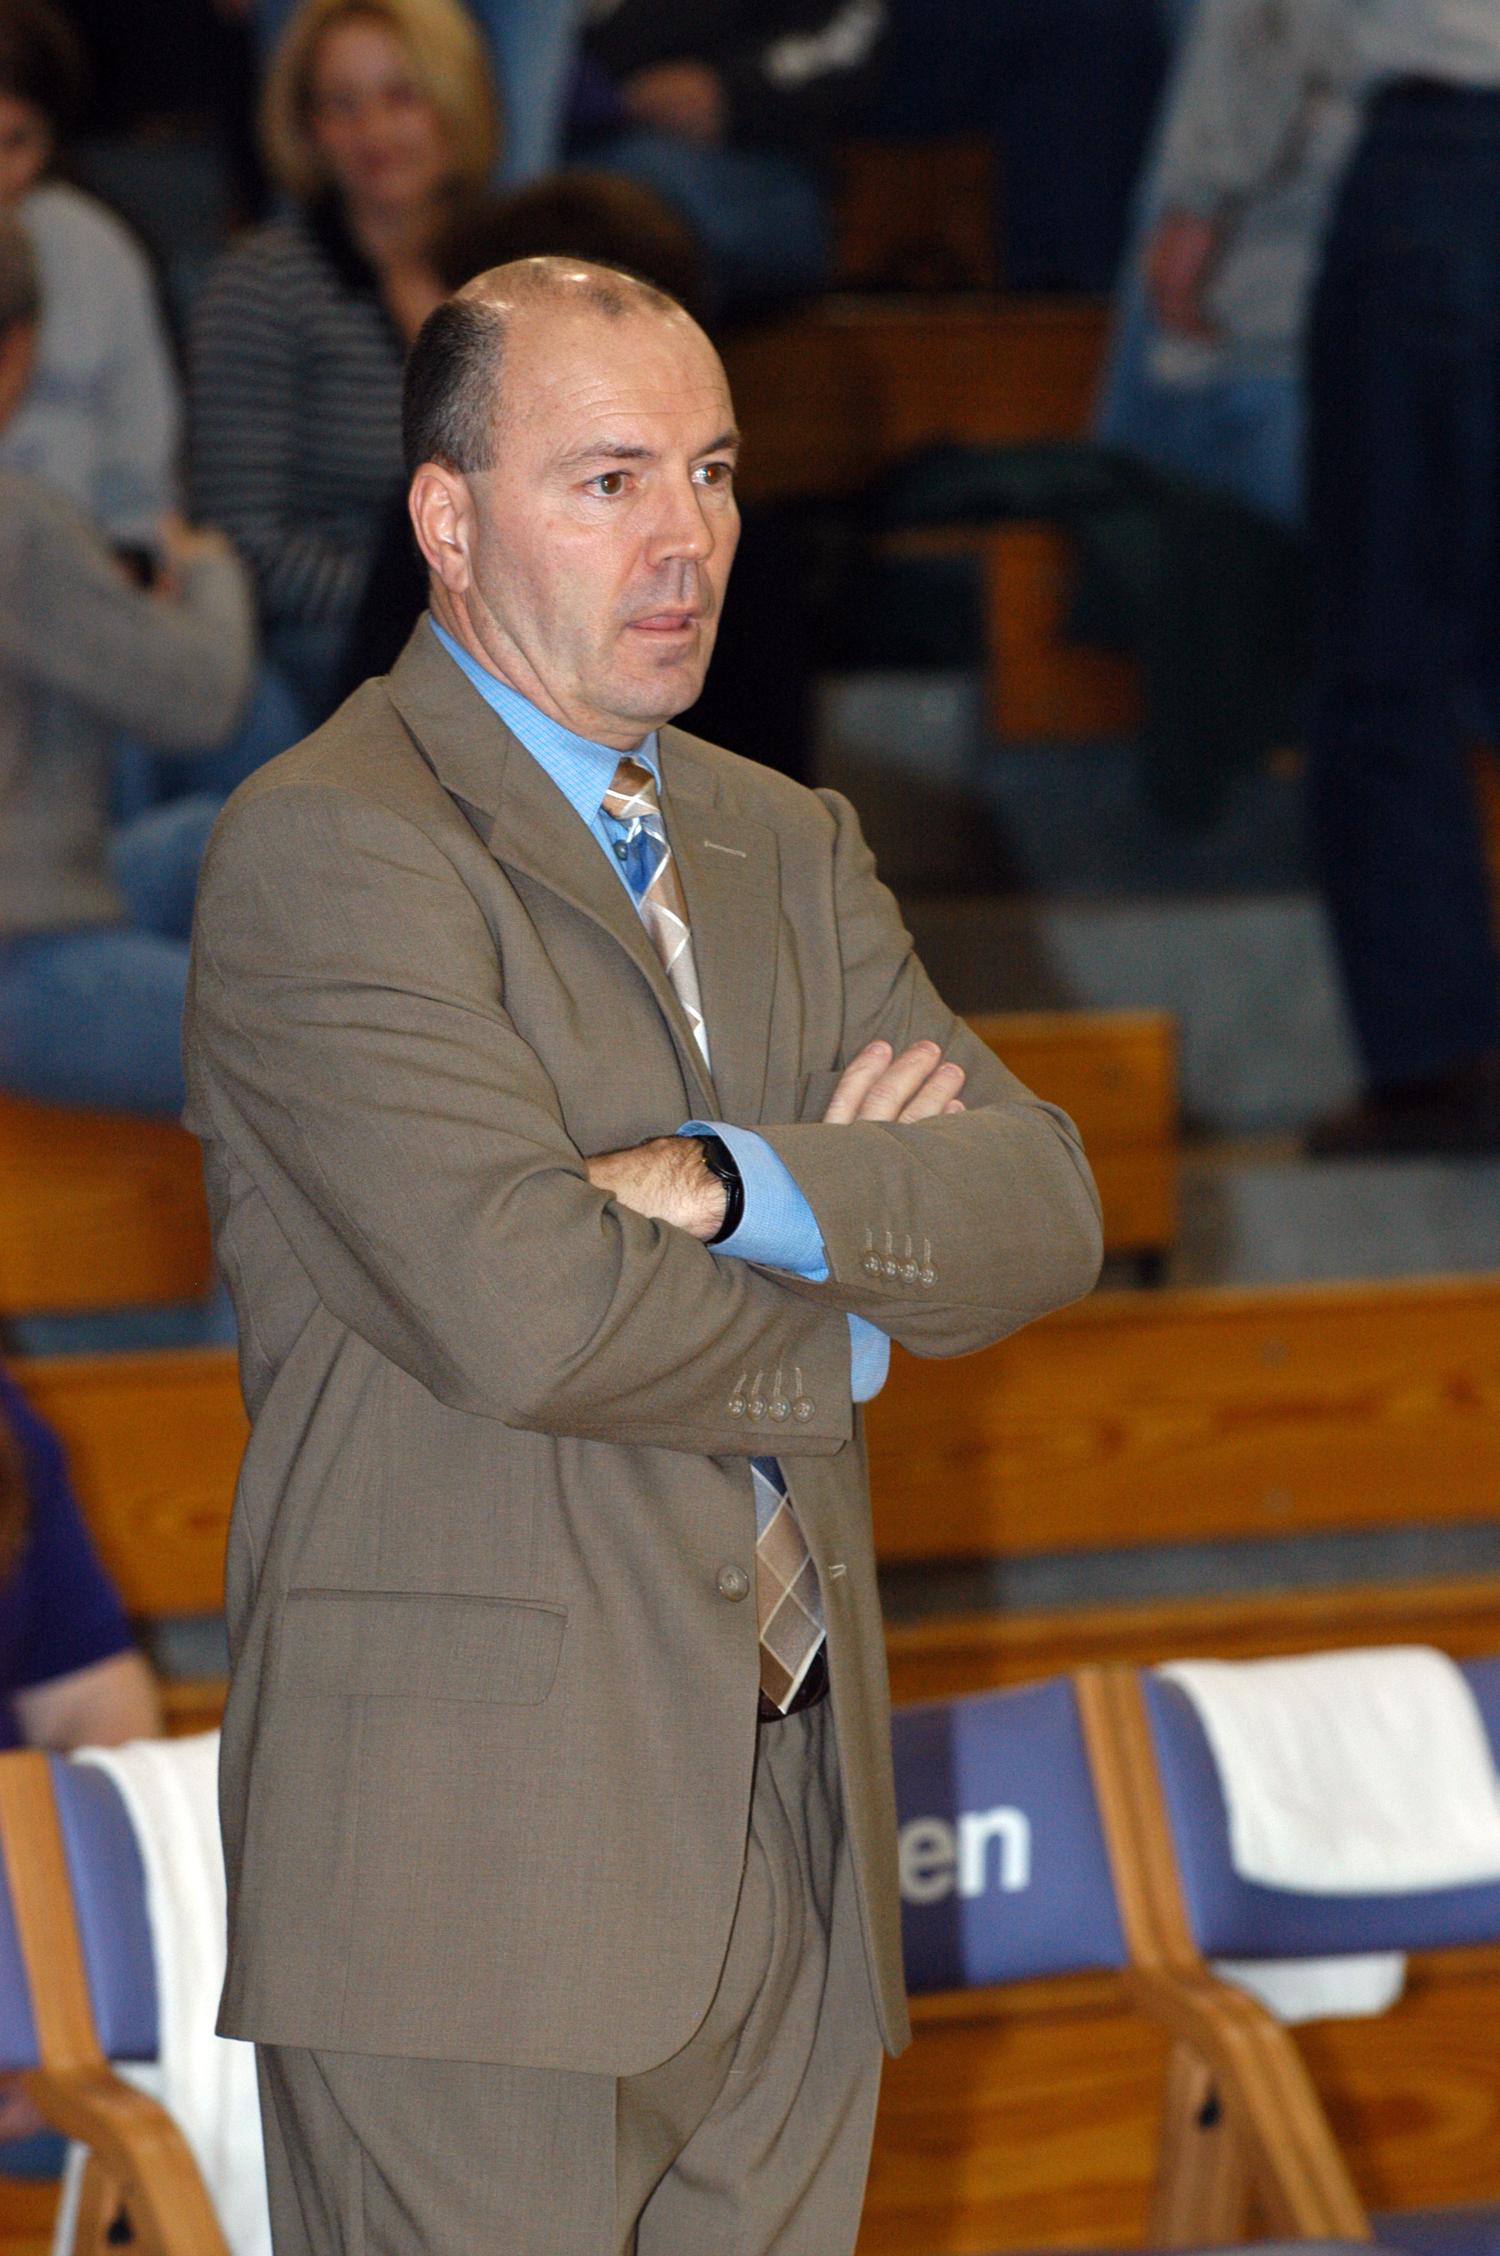 Coach Daugherty during his tenure at Goshen College